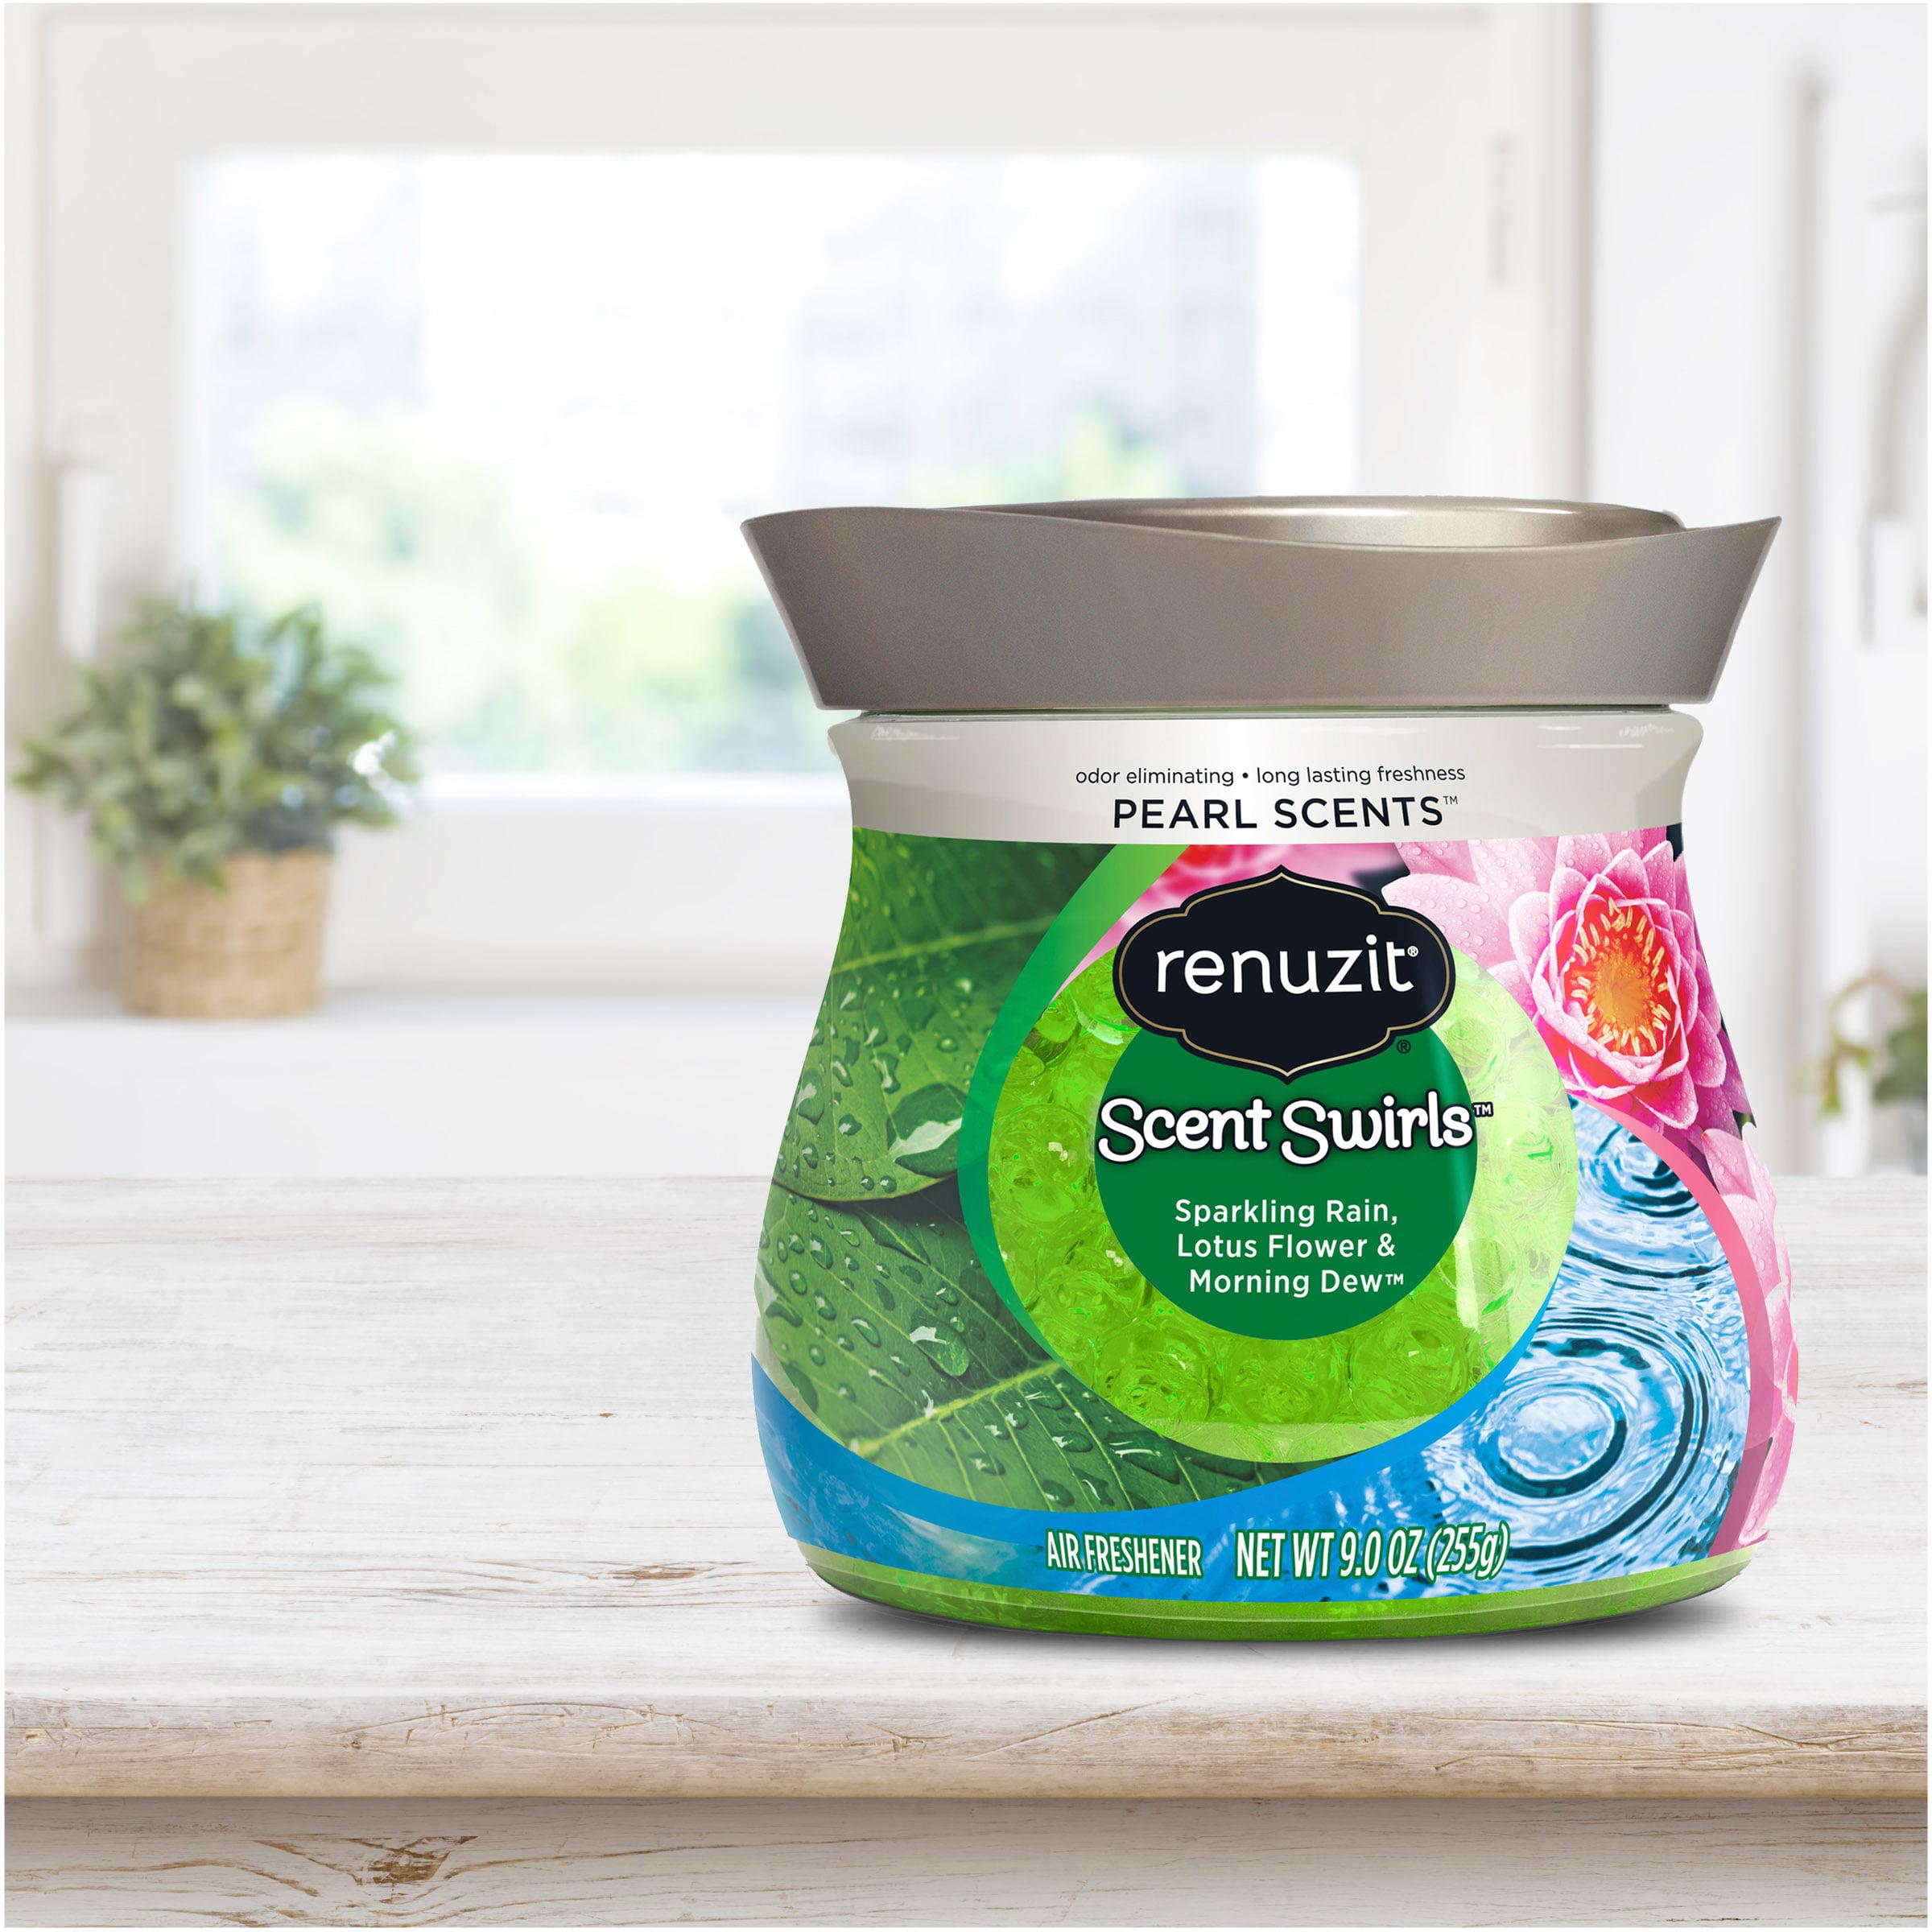 Renuzit Pearl Scents Air Freshener Sparkling Rain Lotus Flower